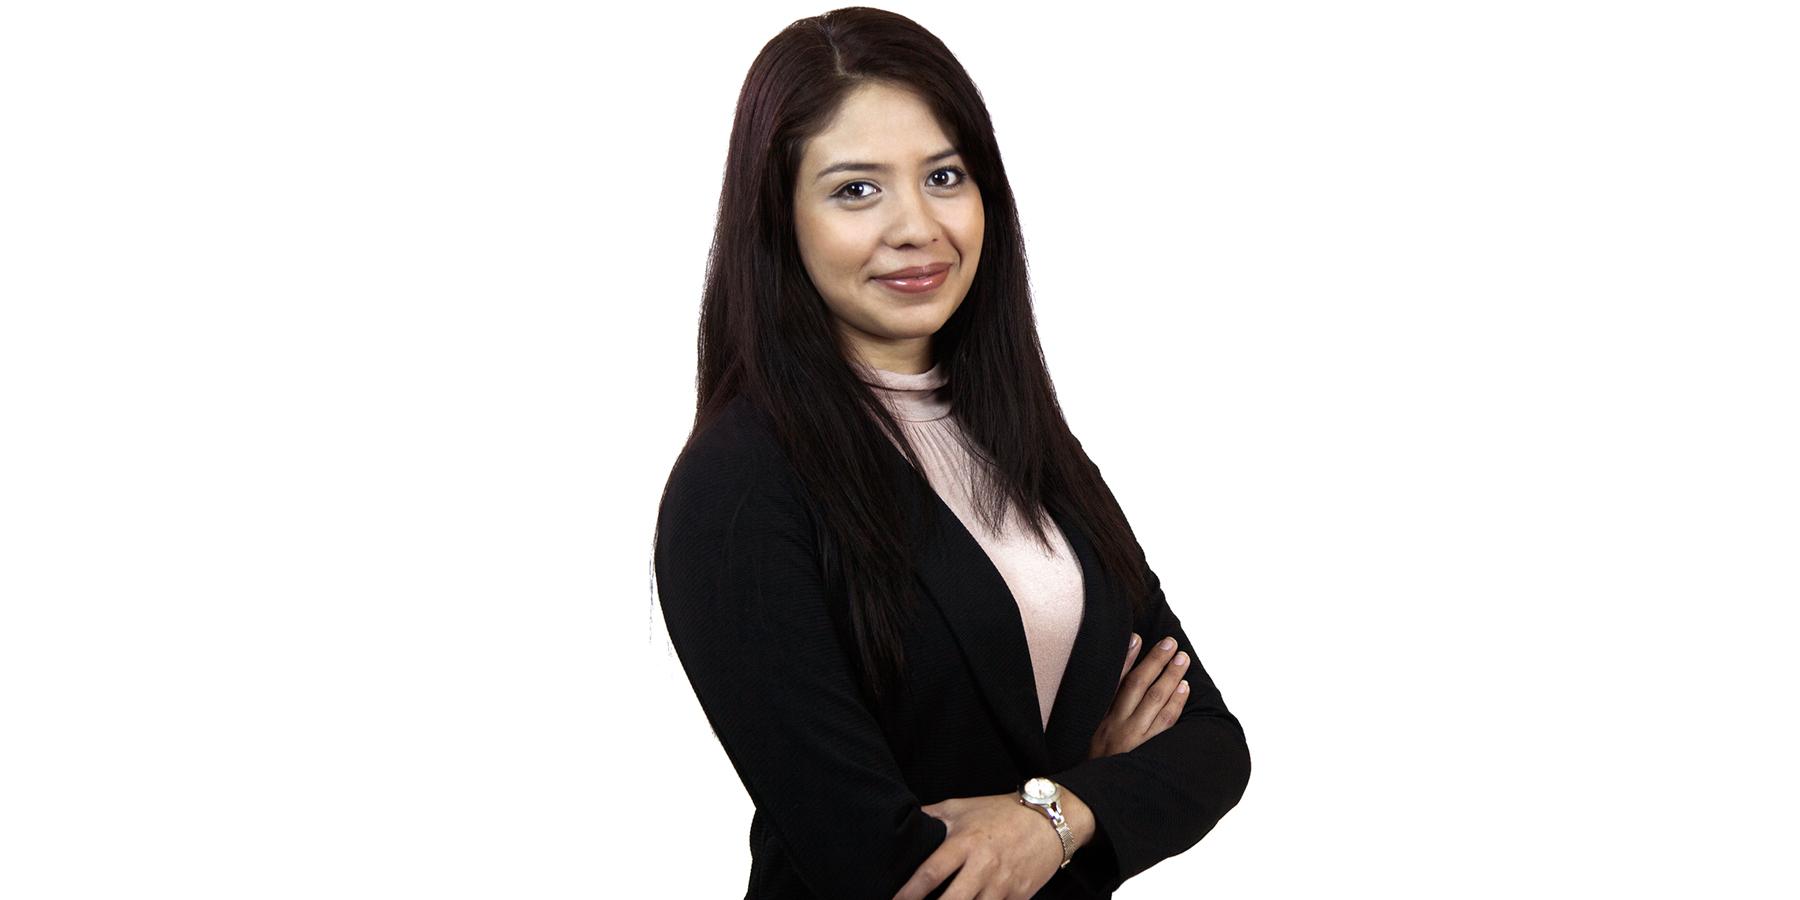 Lic. Jacqueline del Rocio Olea Castro